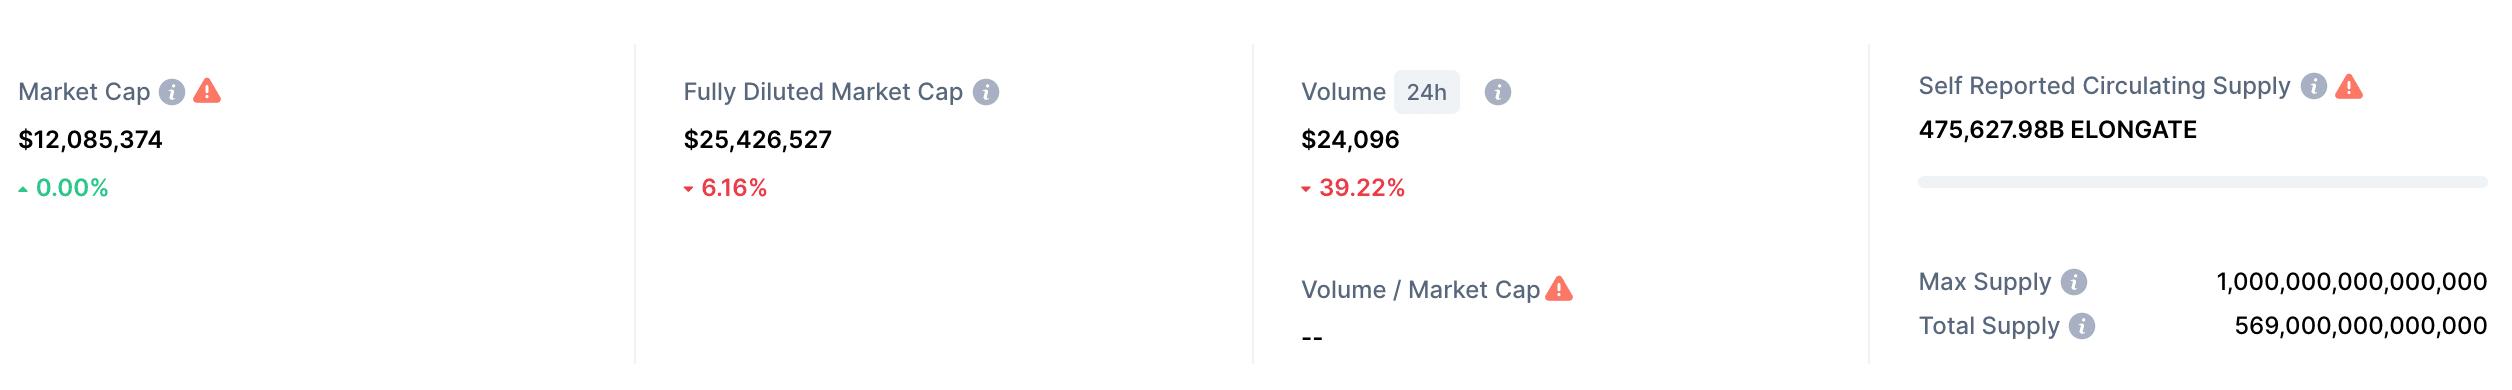 elongate market cap